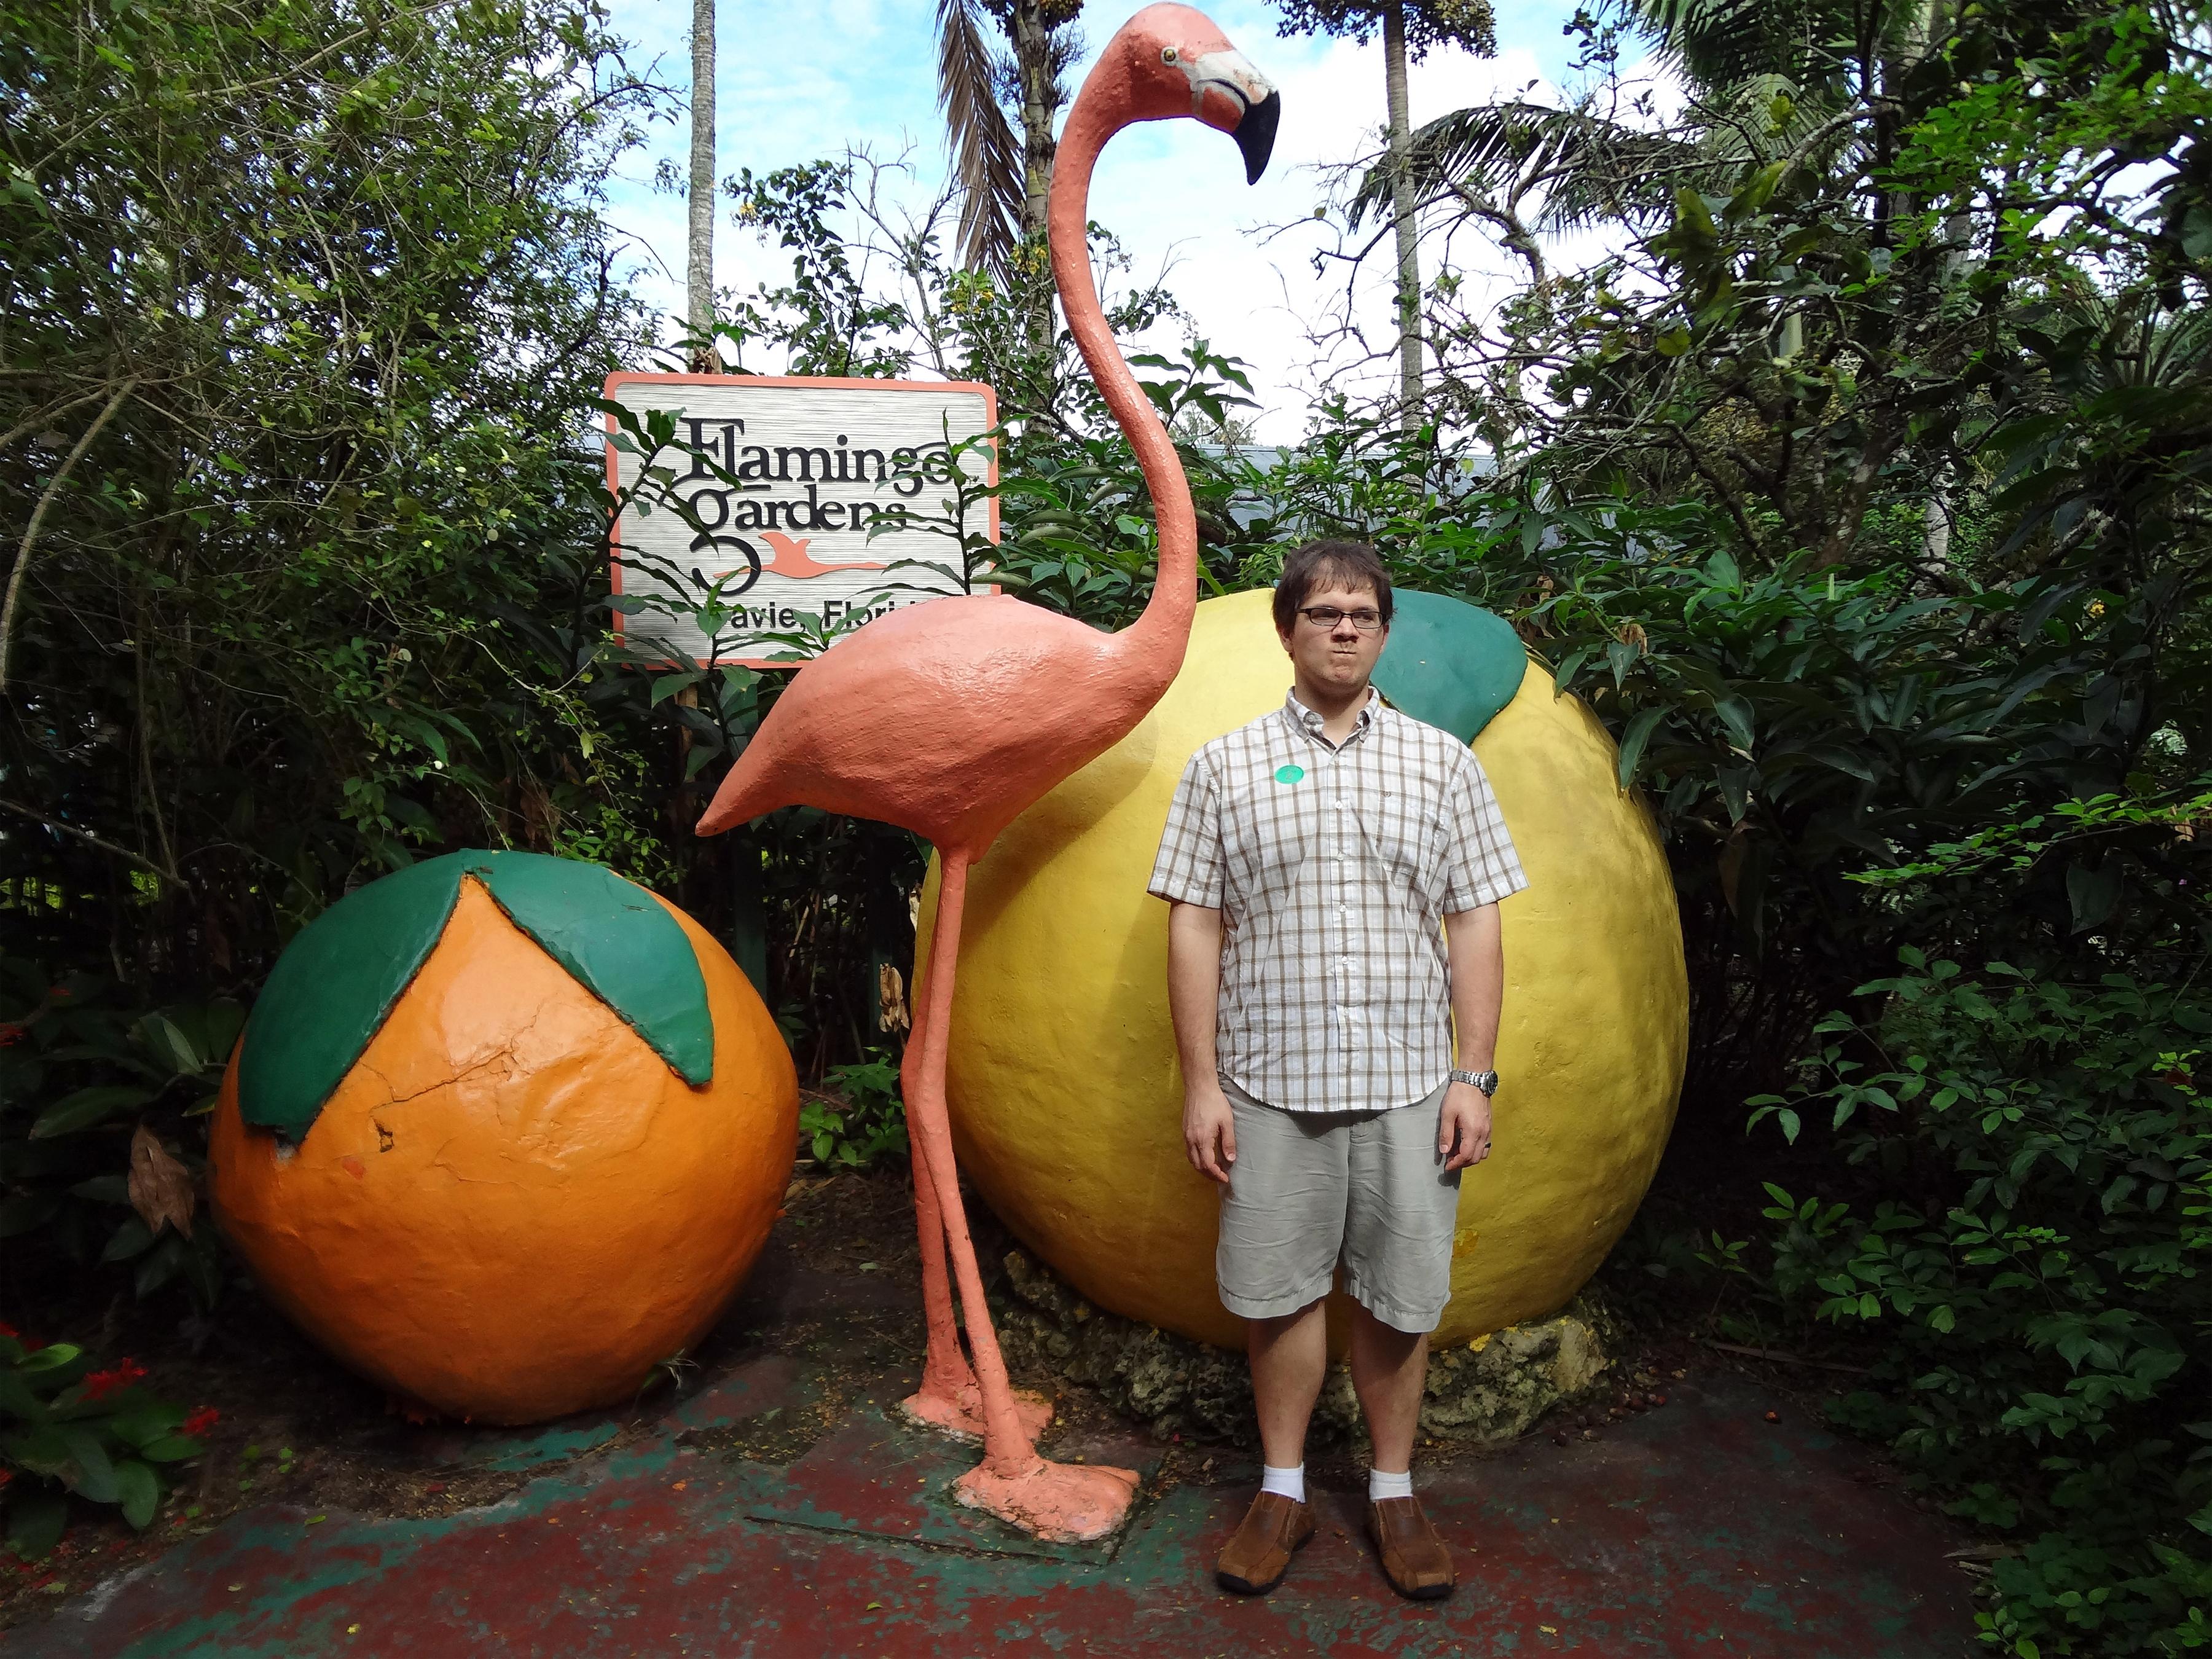 Flamingo Gardens Fort Lauderdale Garden Ftempo